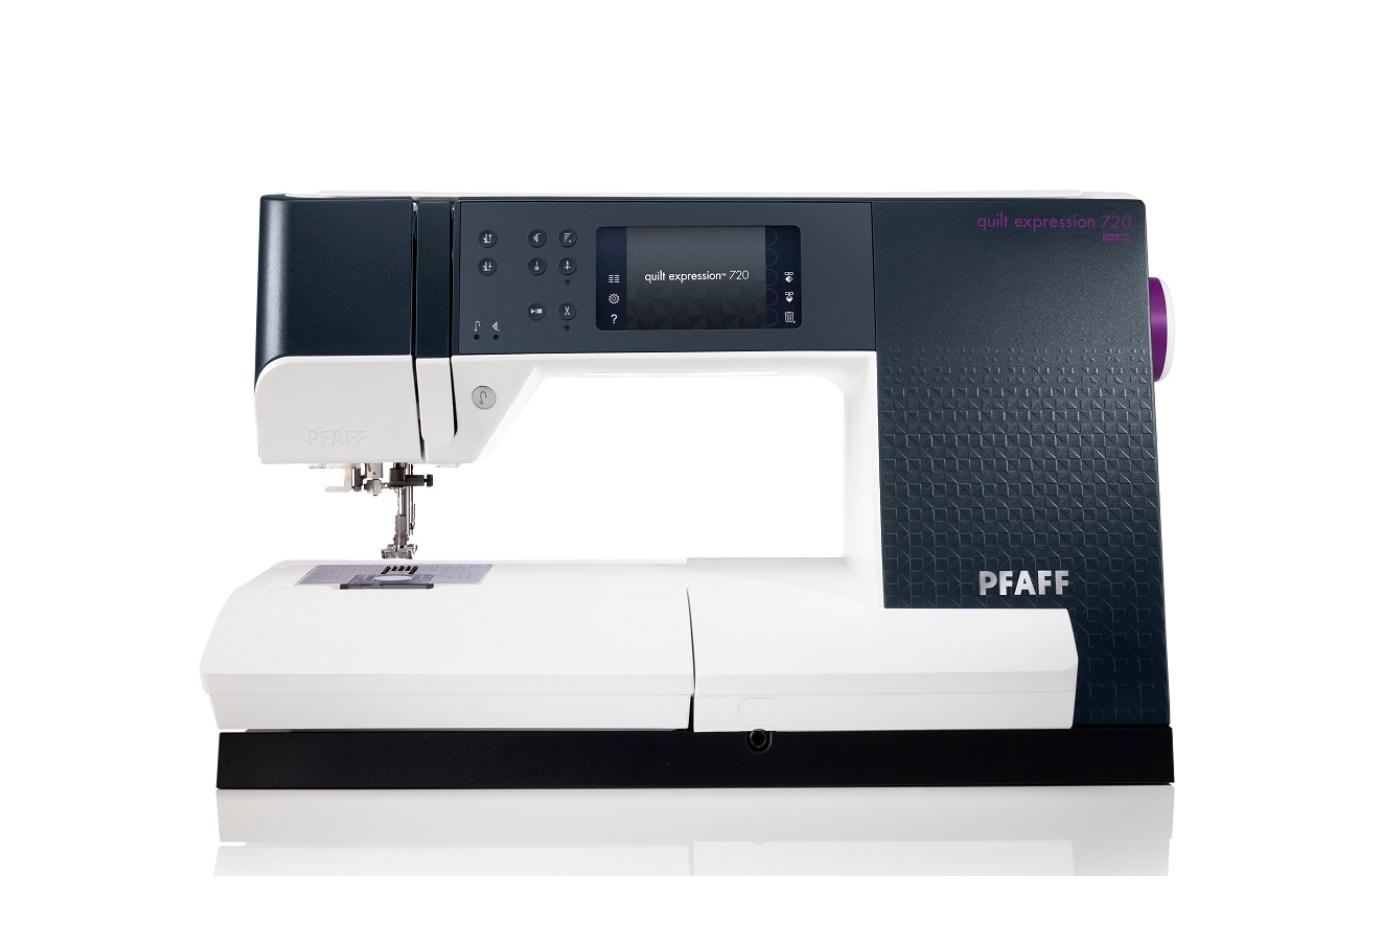 Naaimachine Voor Quilten.Pfaff Quilt Expression 720 Naaimachine Bij Schuring Naaimachines